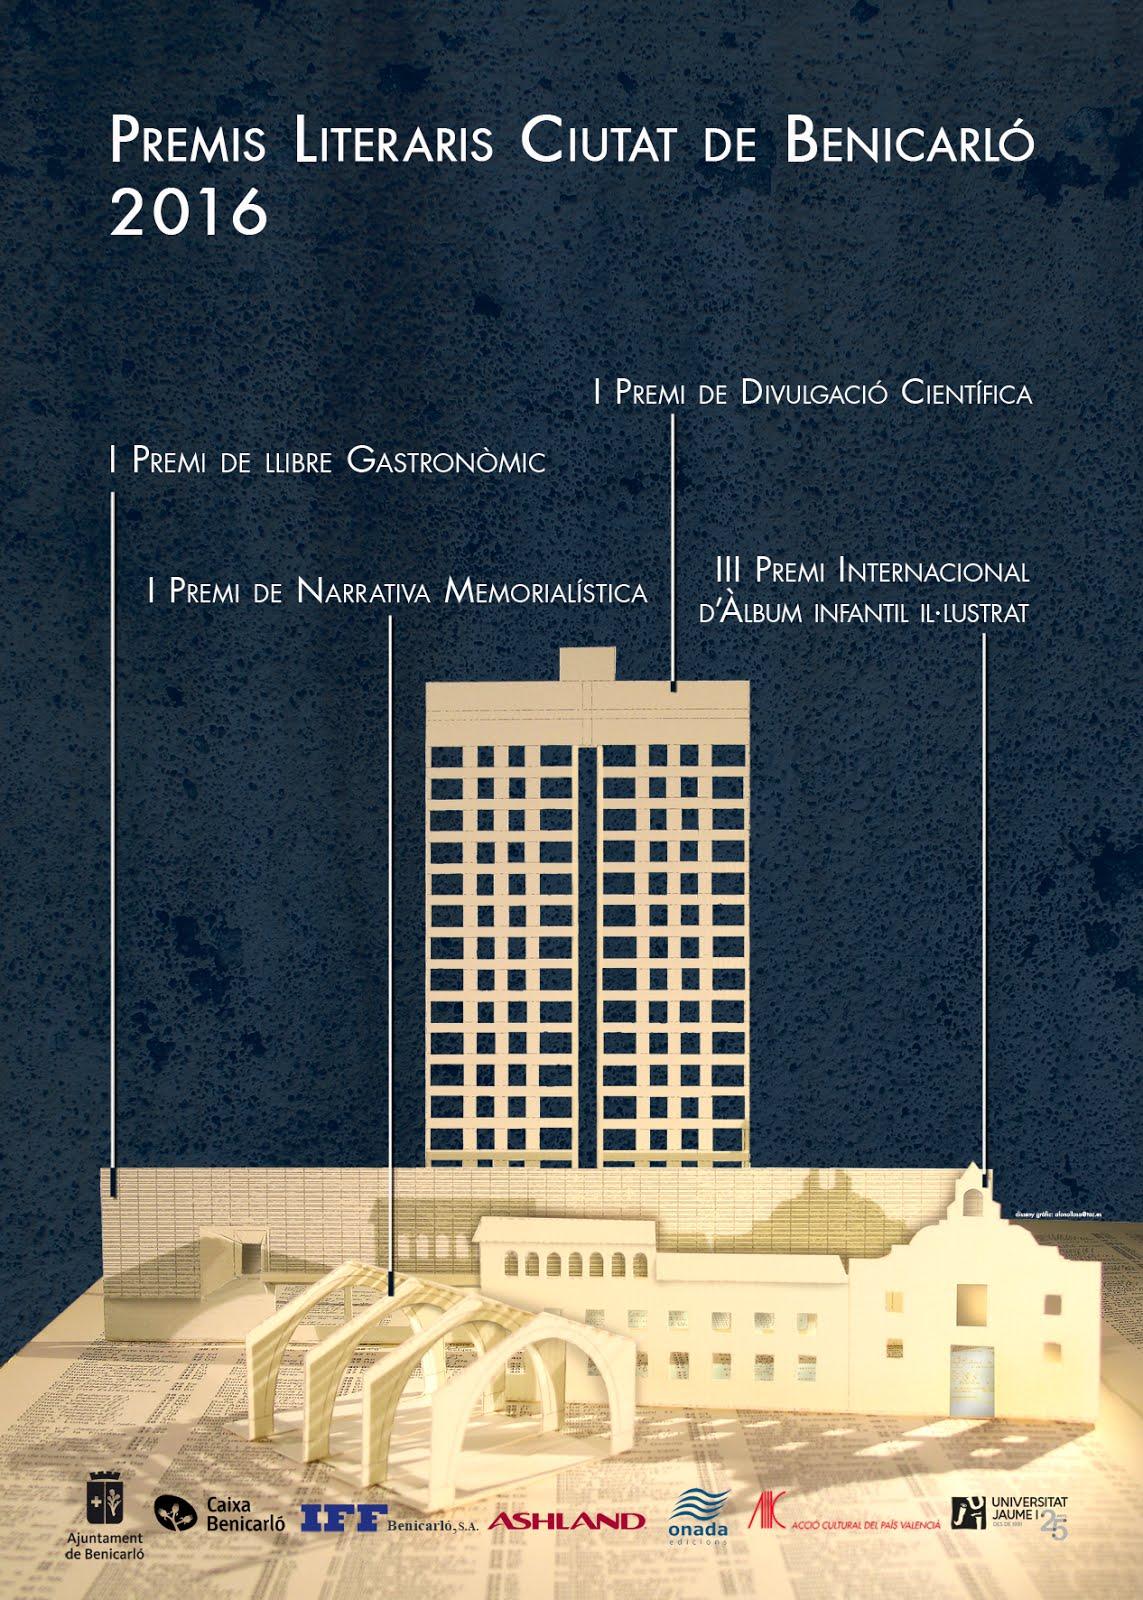 Premis Literaris Ciutat de Benicarló 2016